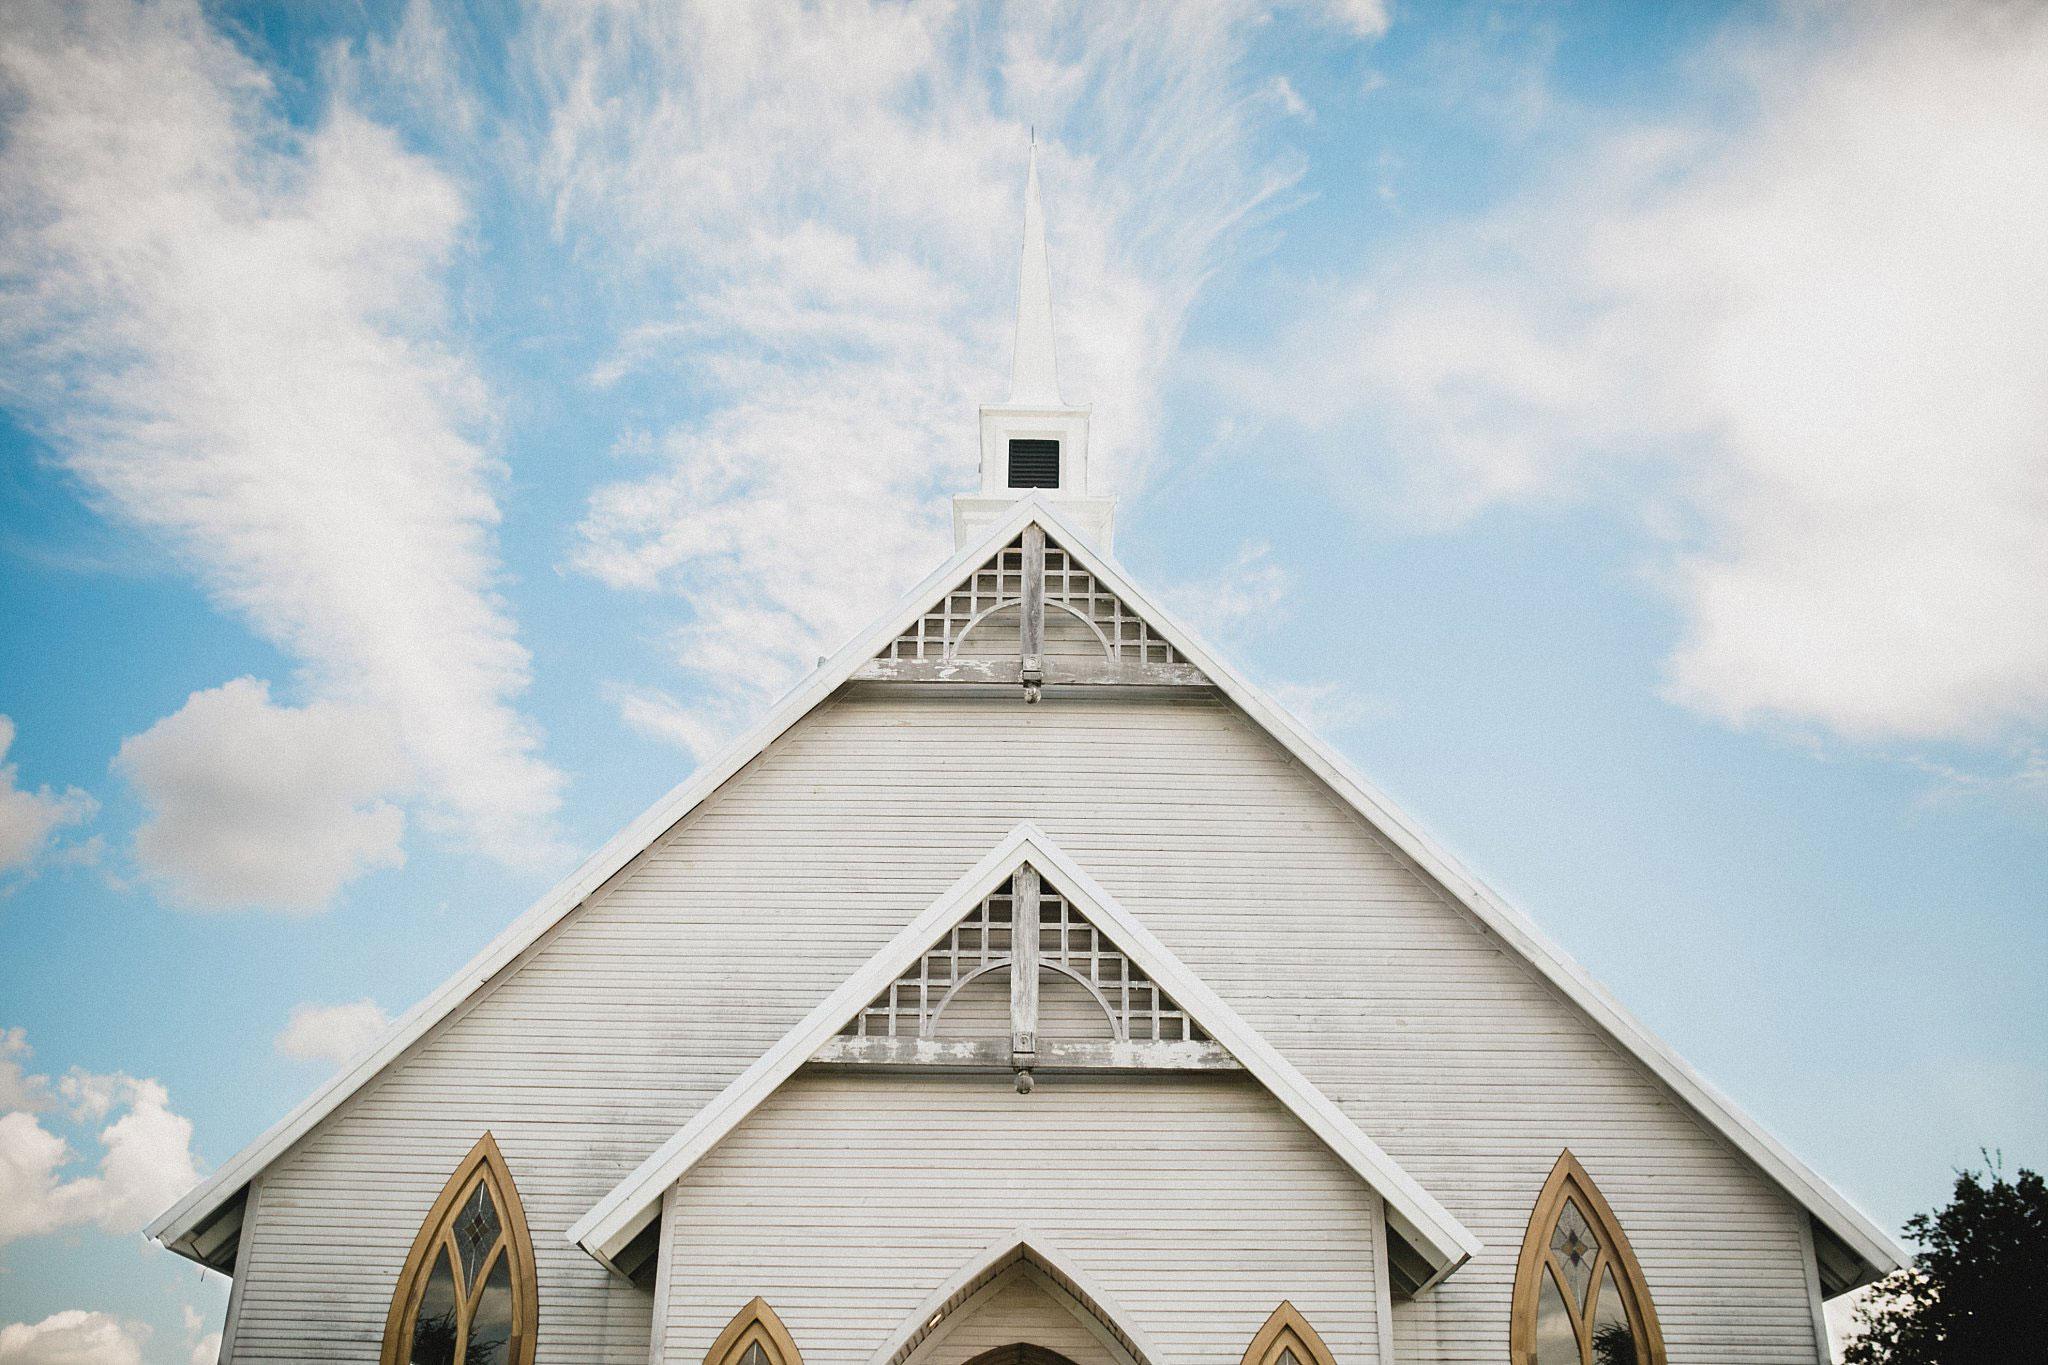 White wedding chapel steeple